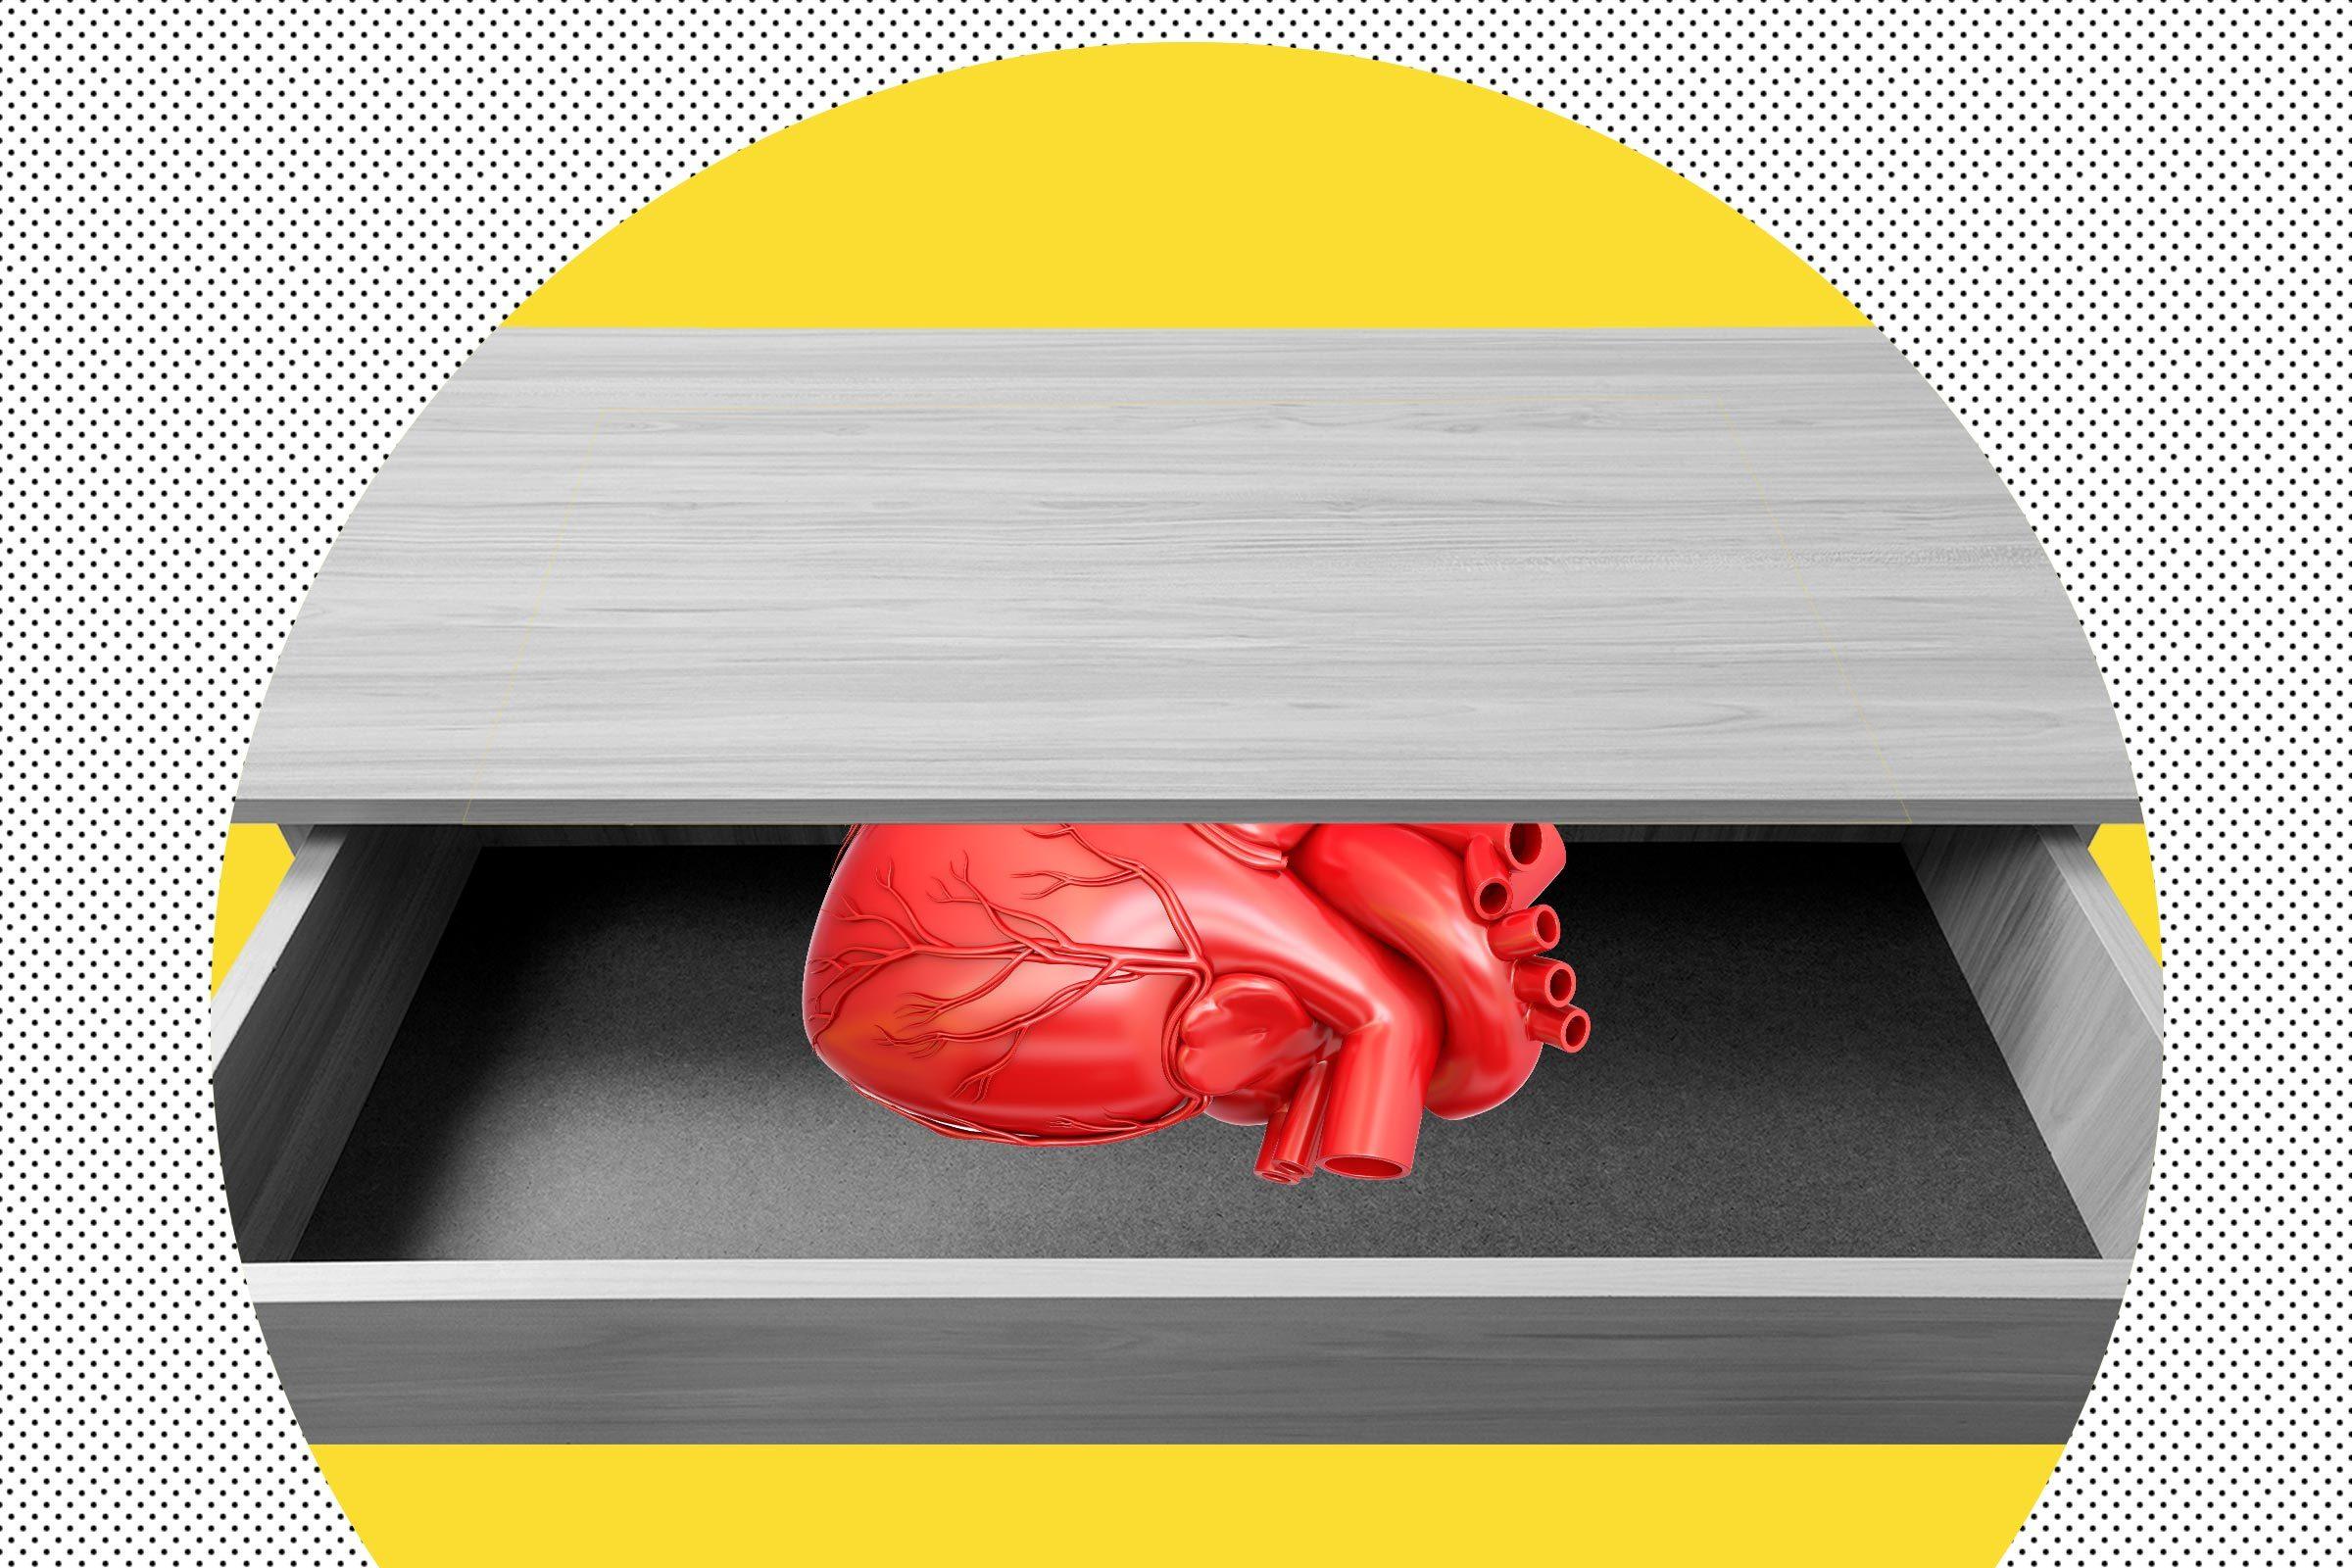 Heart in Desk Drawer